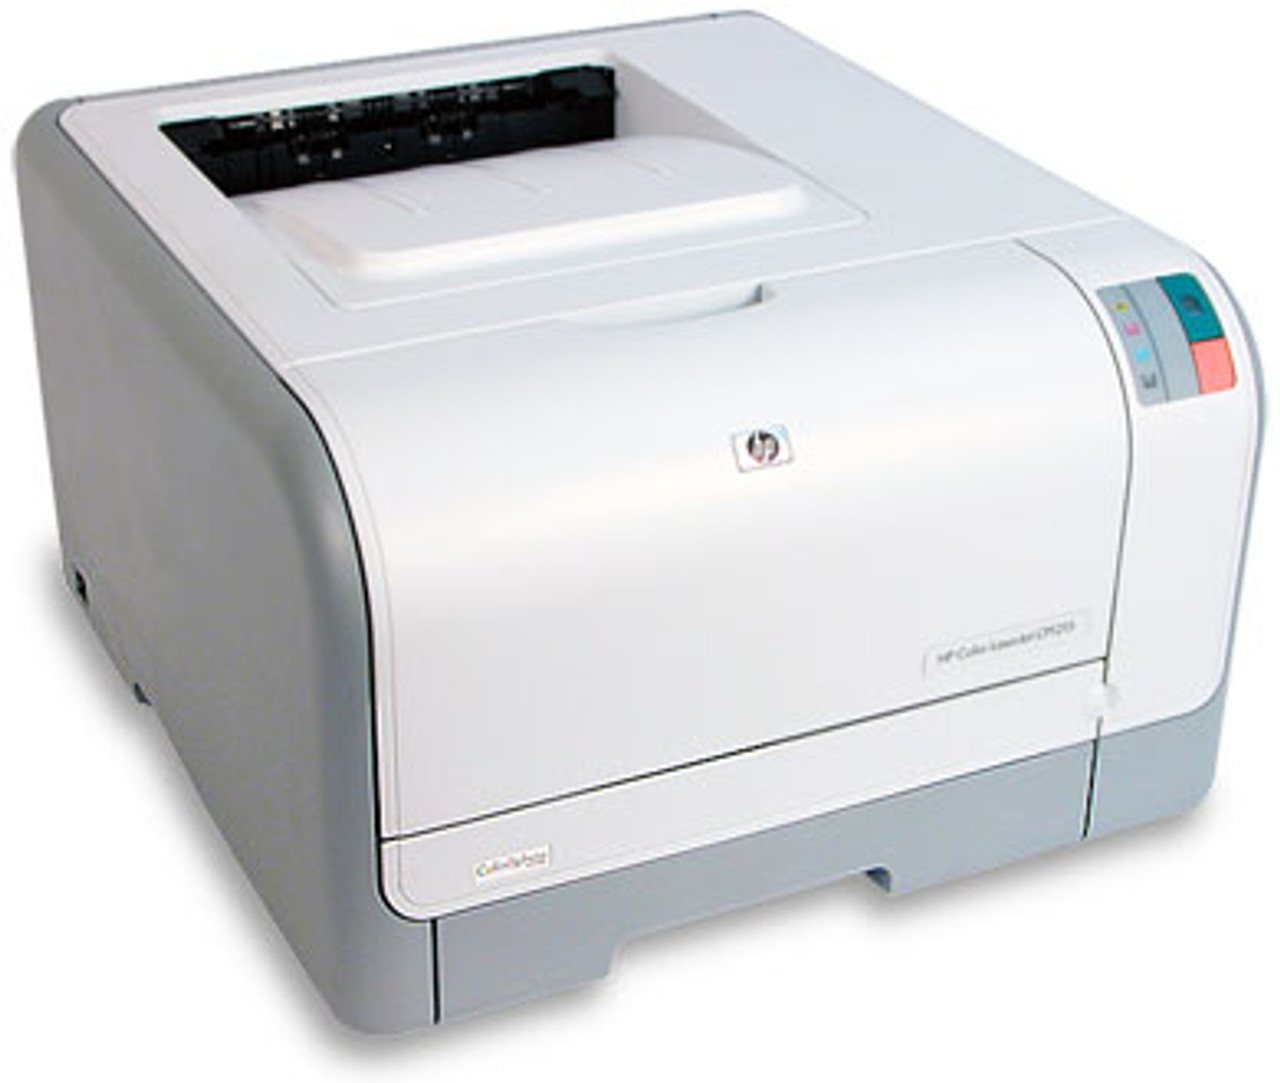 HP Color LaserJet CP1215 - CC376A - HP Laser Printer for sale